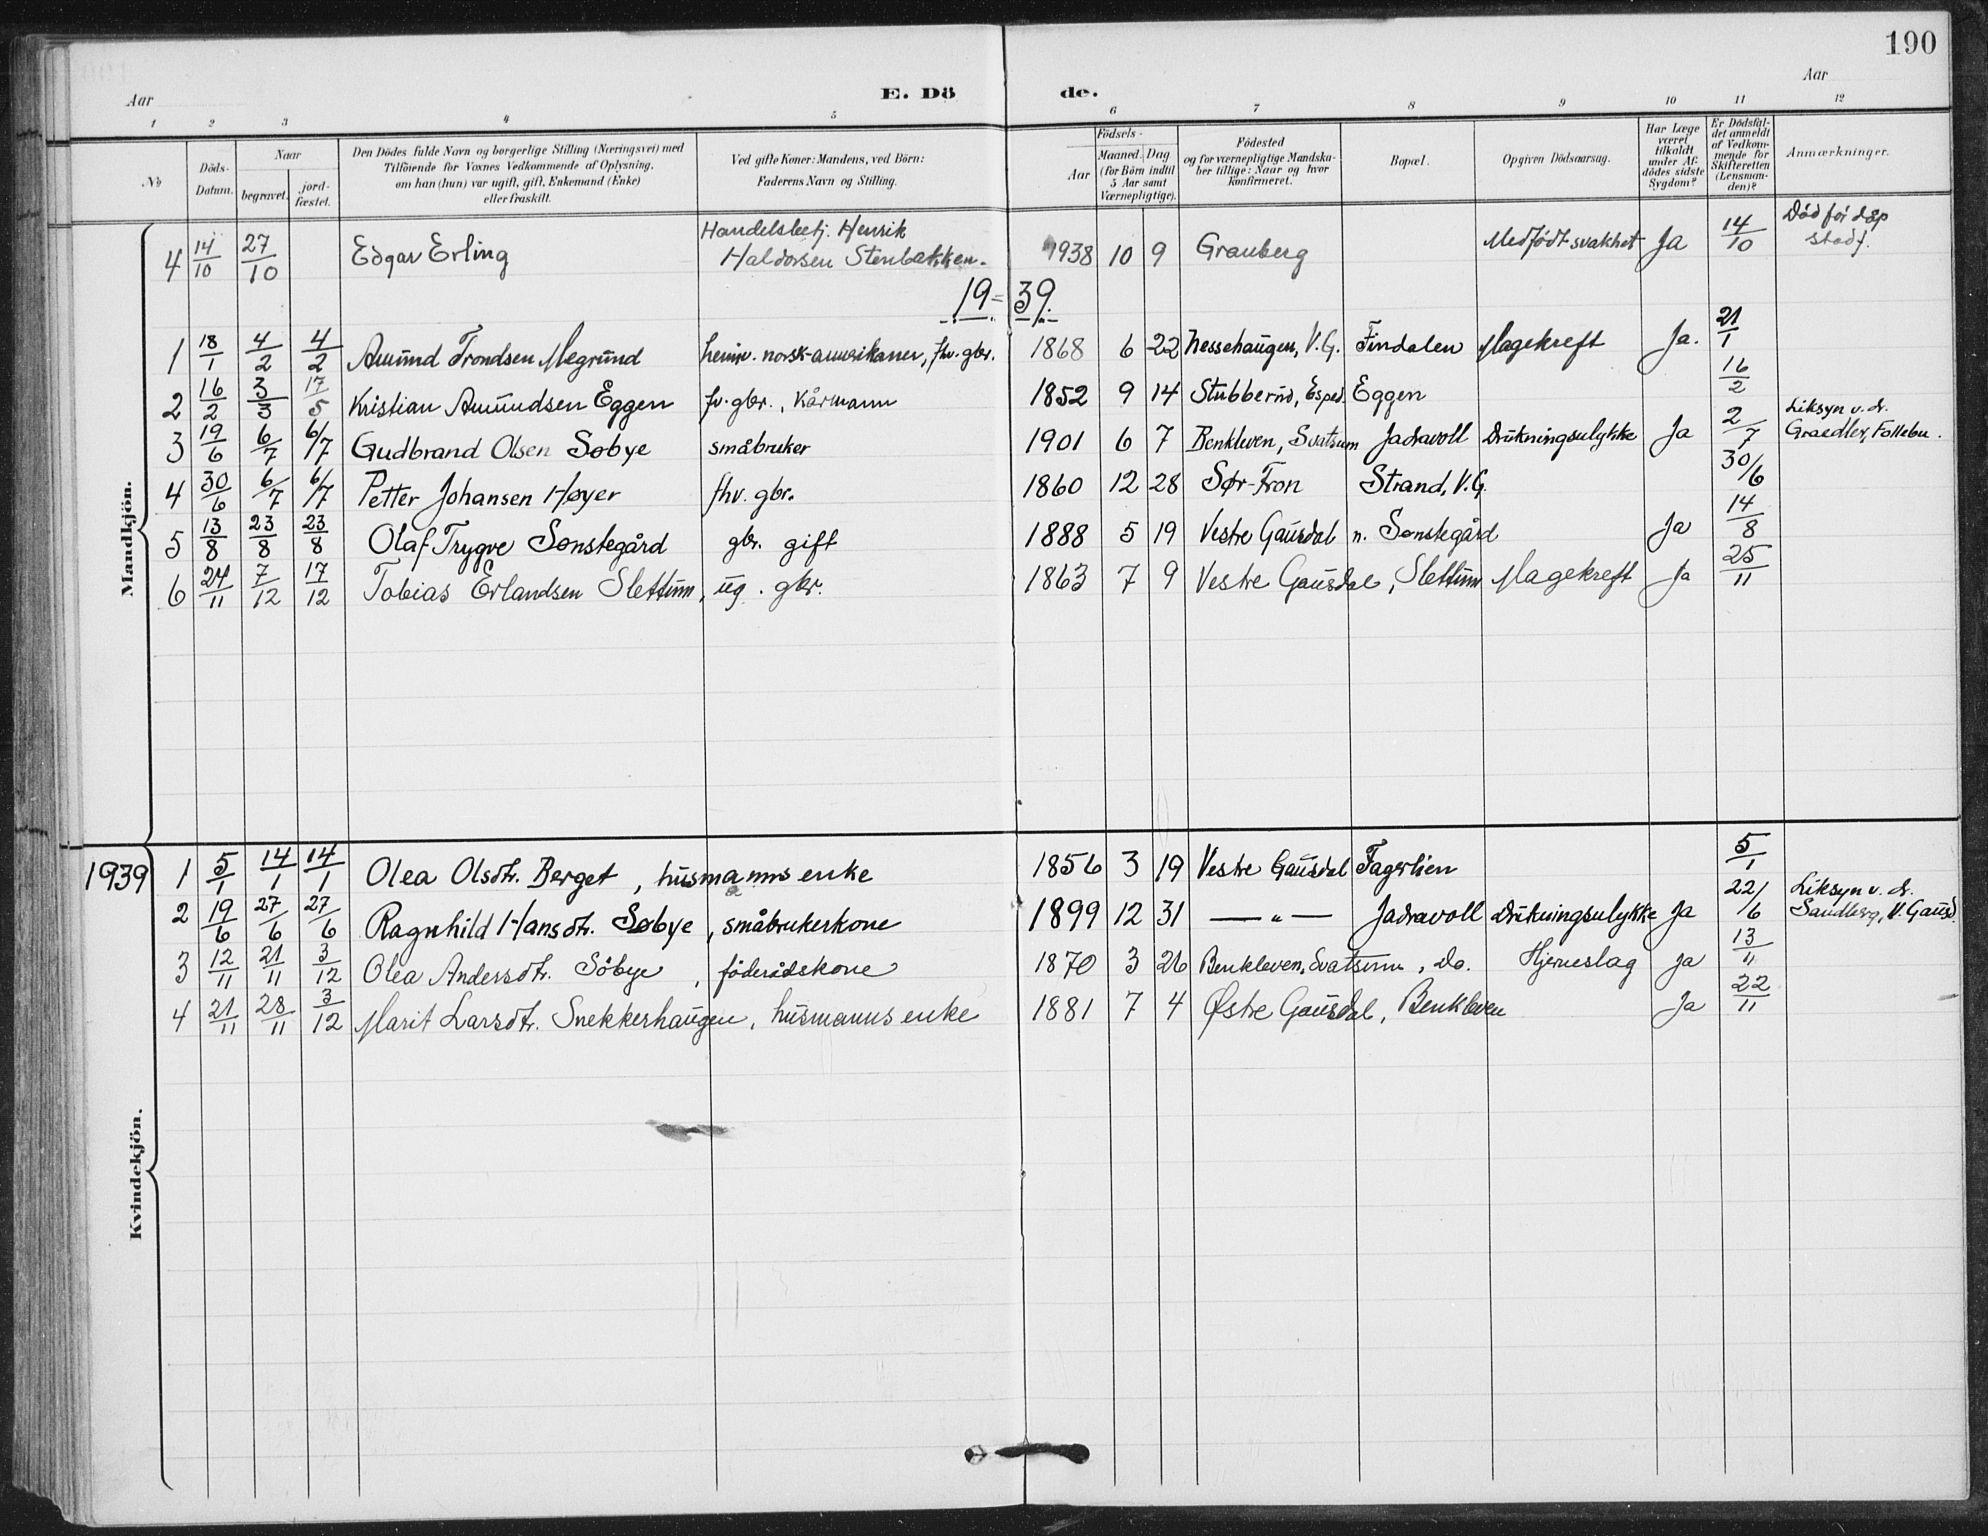 SAH, Vestre Gausdal prestekontor, Klokkerbok nr. 4, 1898-1939, s. 190